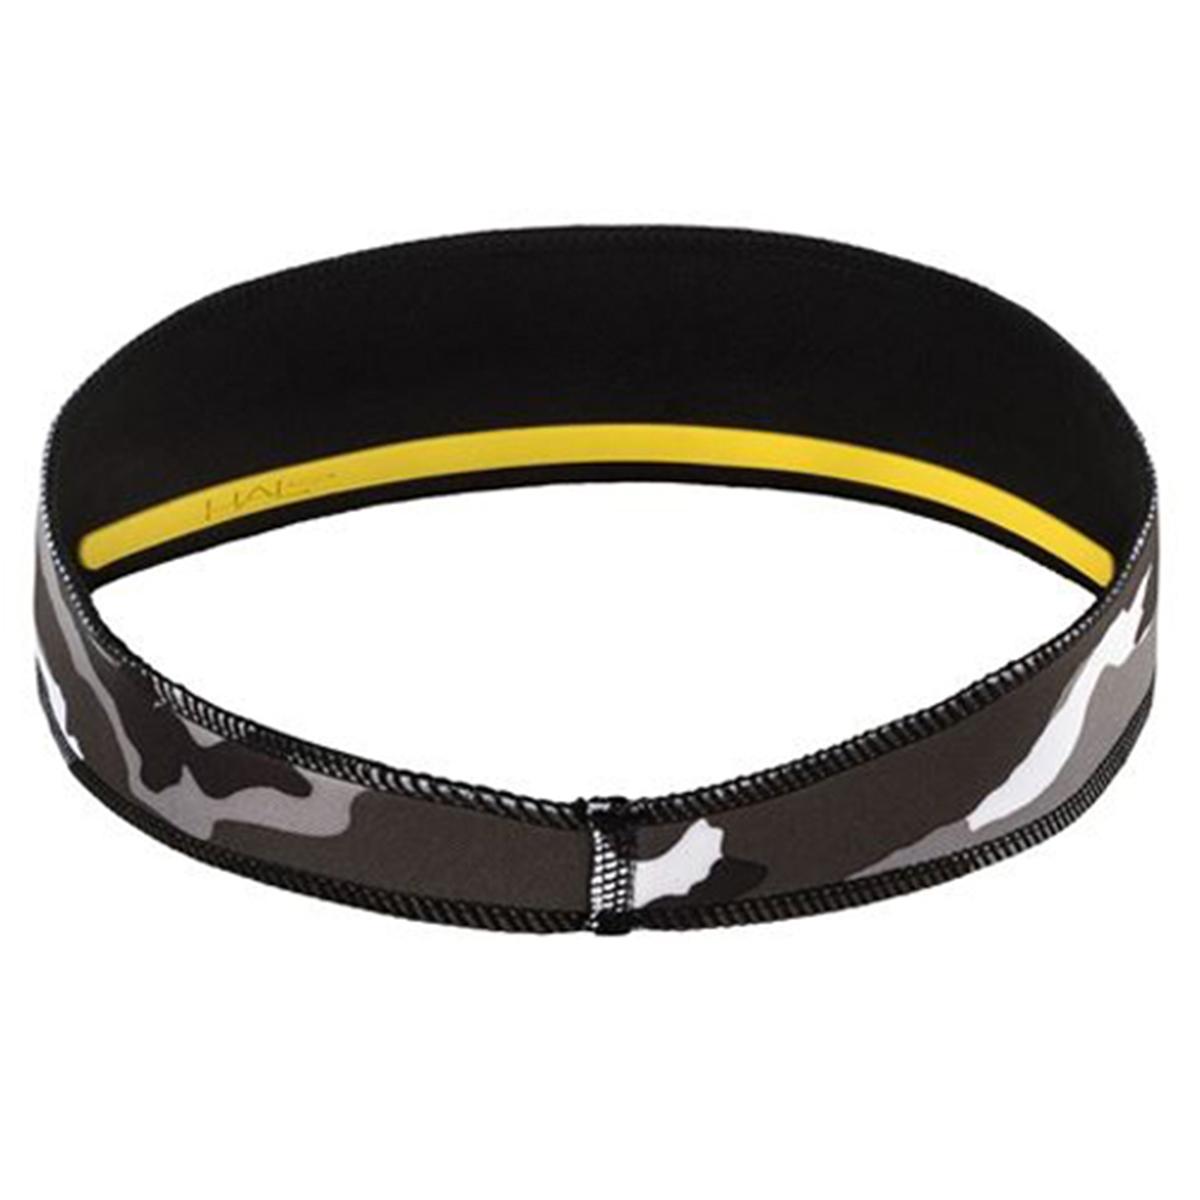 Halo-Headband-Pullover-II-Sweatband miniatuur 28